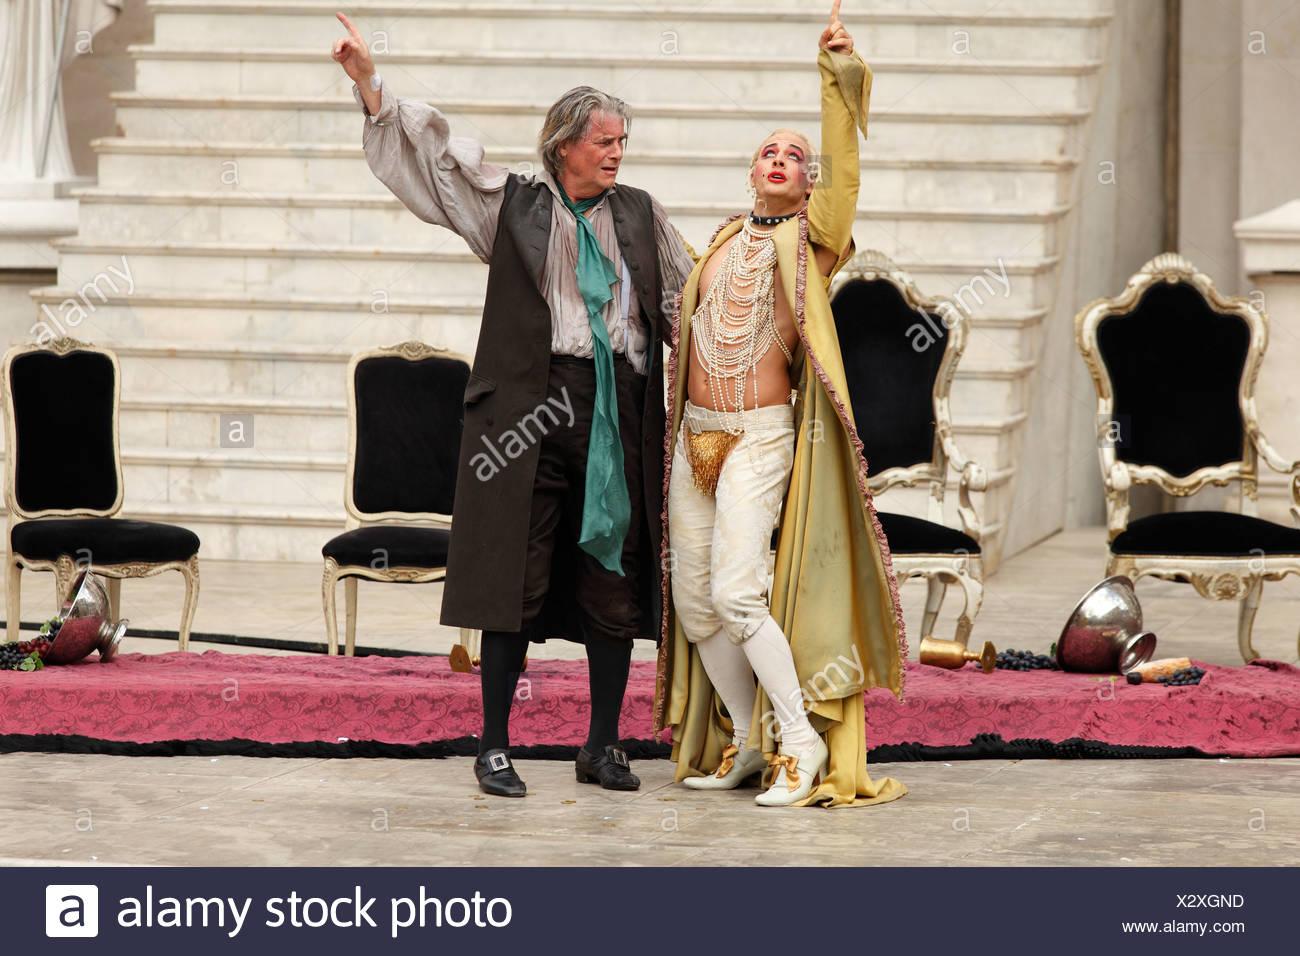 Jedermann, Everyman, 2009, played by Peter Simonischek with Gabriel Raab as Mammon, play by Hugo von Hofmannsthal, Salzburg Fes - Stock Image